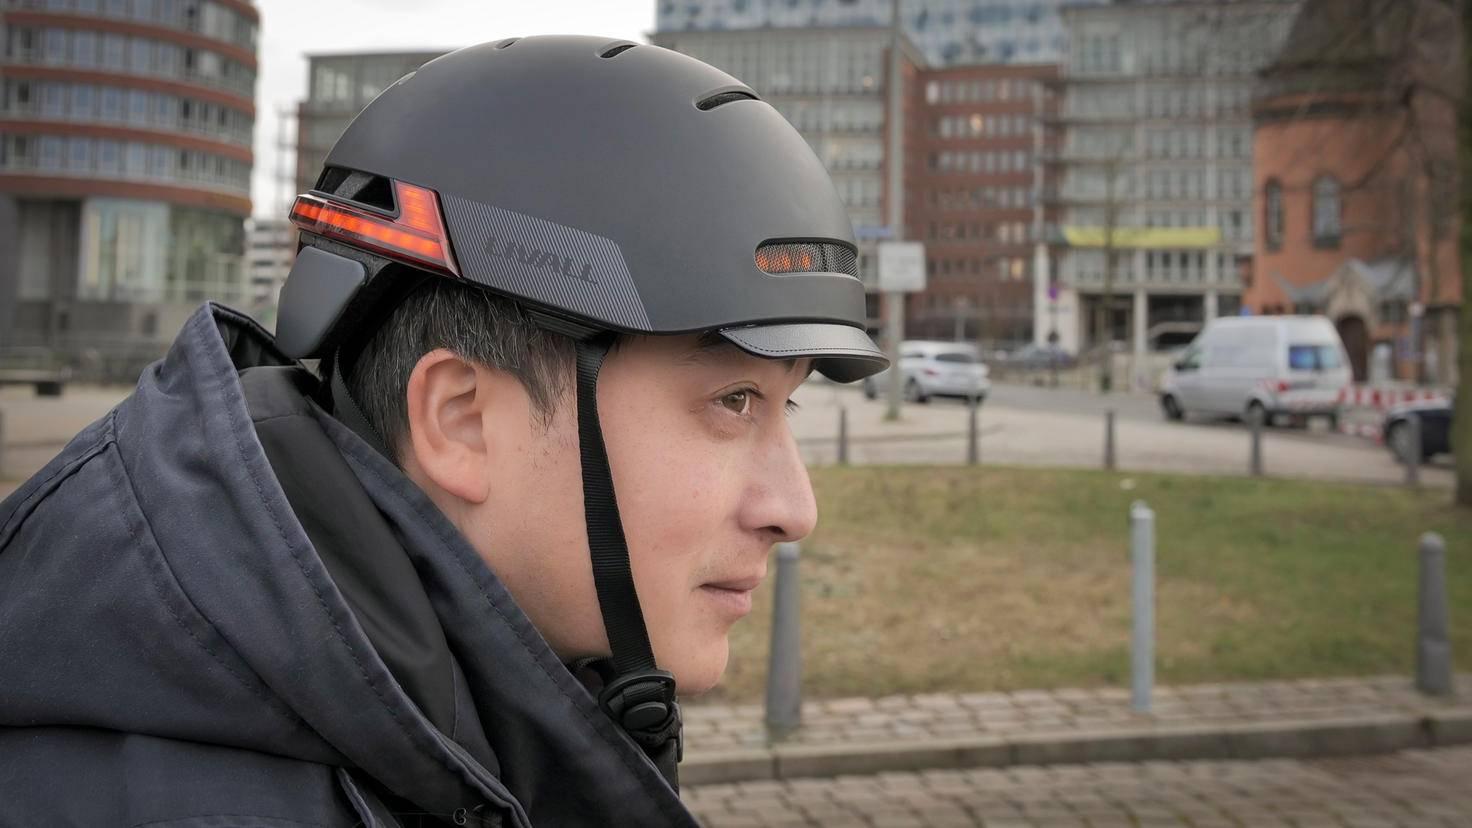 livall-bh-51-fahrrad-helm-test-02